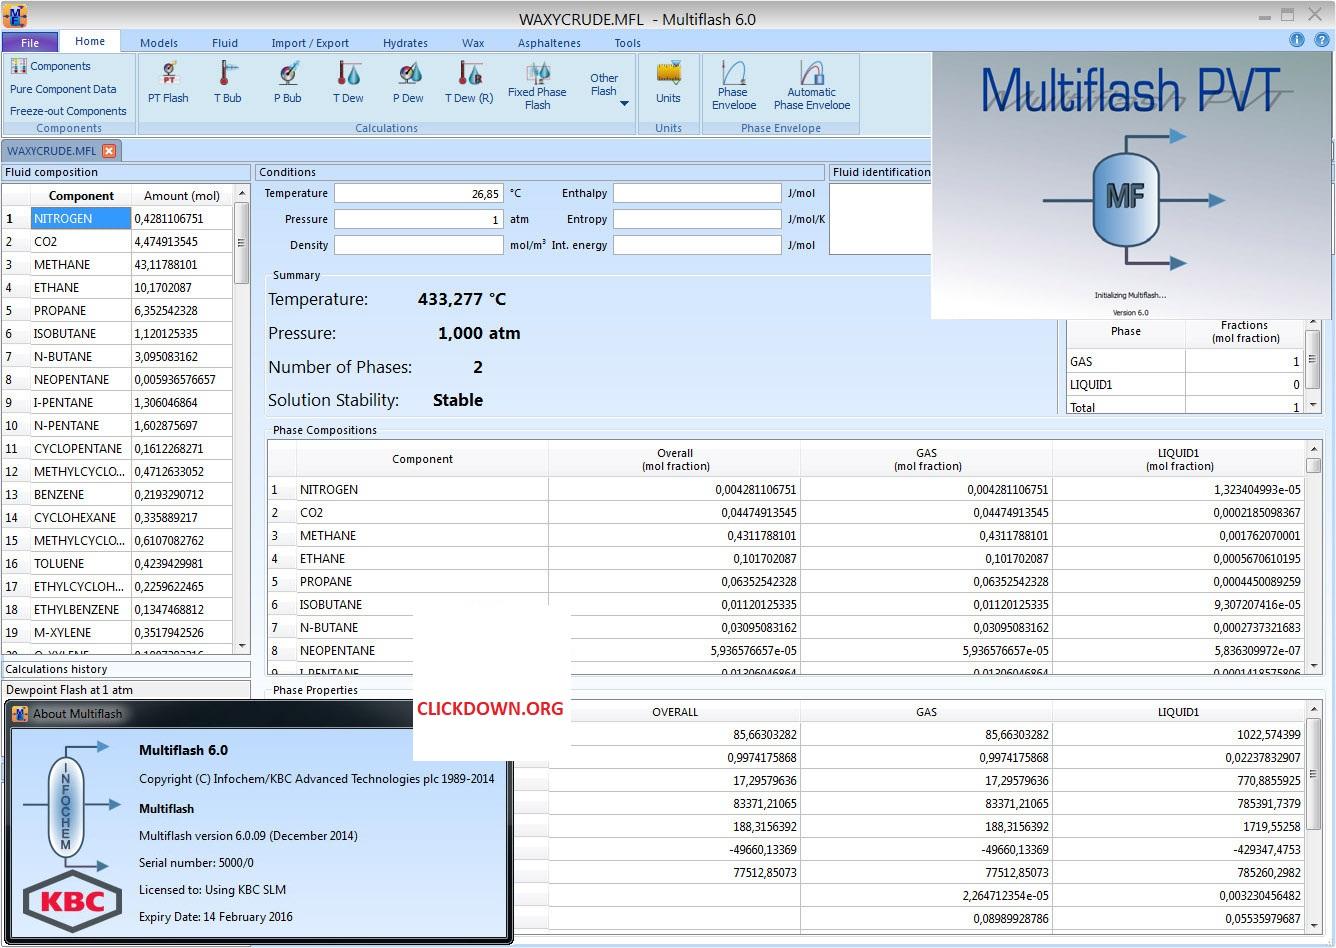 Working with KBC Infochem Multiflash 6.1.25 full license